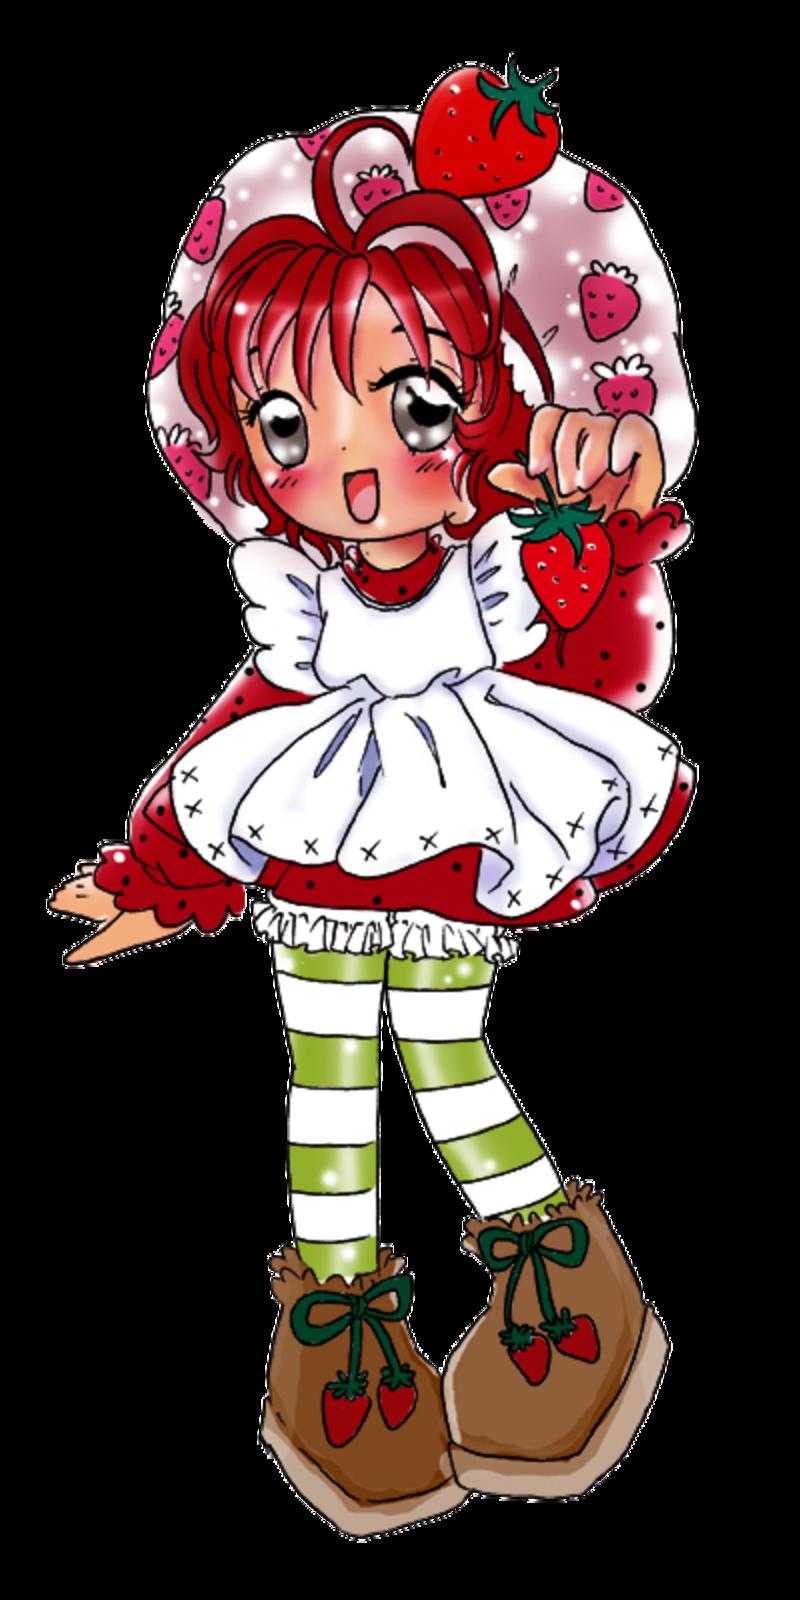 Charlotte aux Fraises (divers) - Page 2 Strawberry_Shortcake_anime_ded